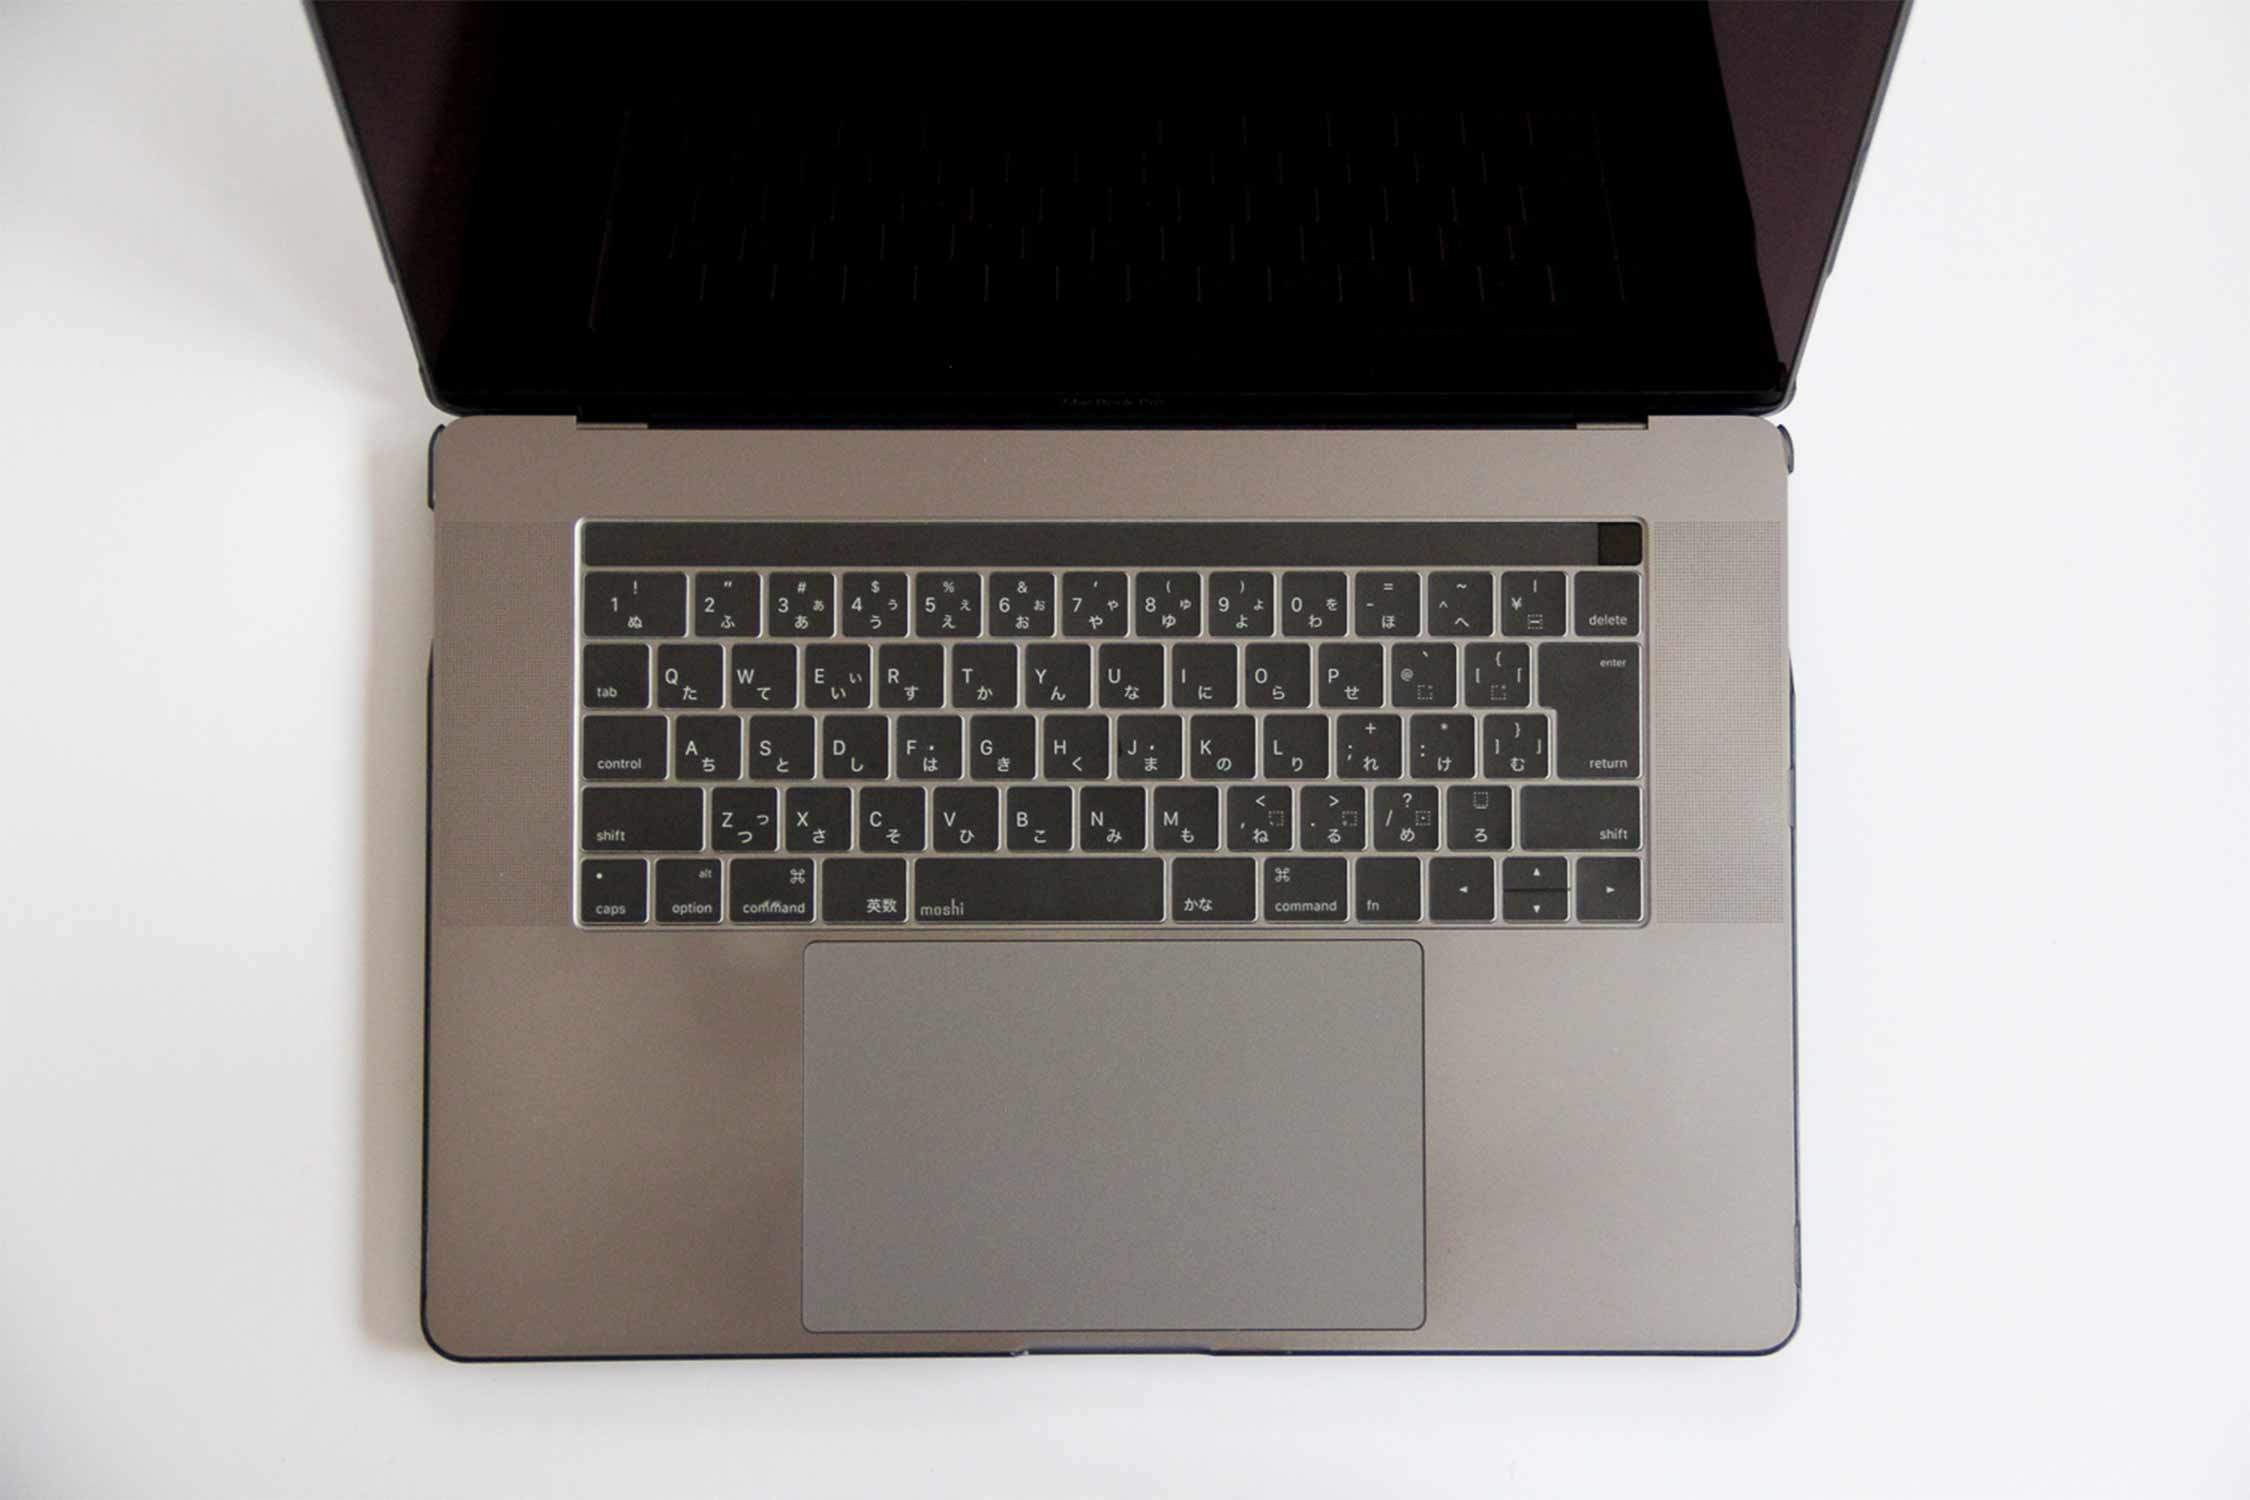 MacBook Pro キーボードカバー装着 写真